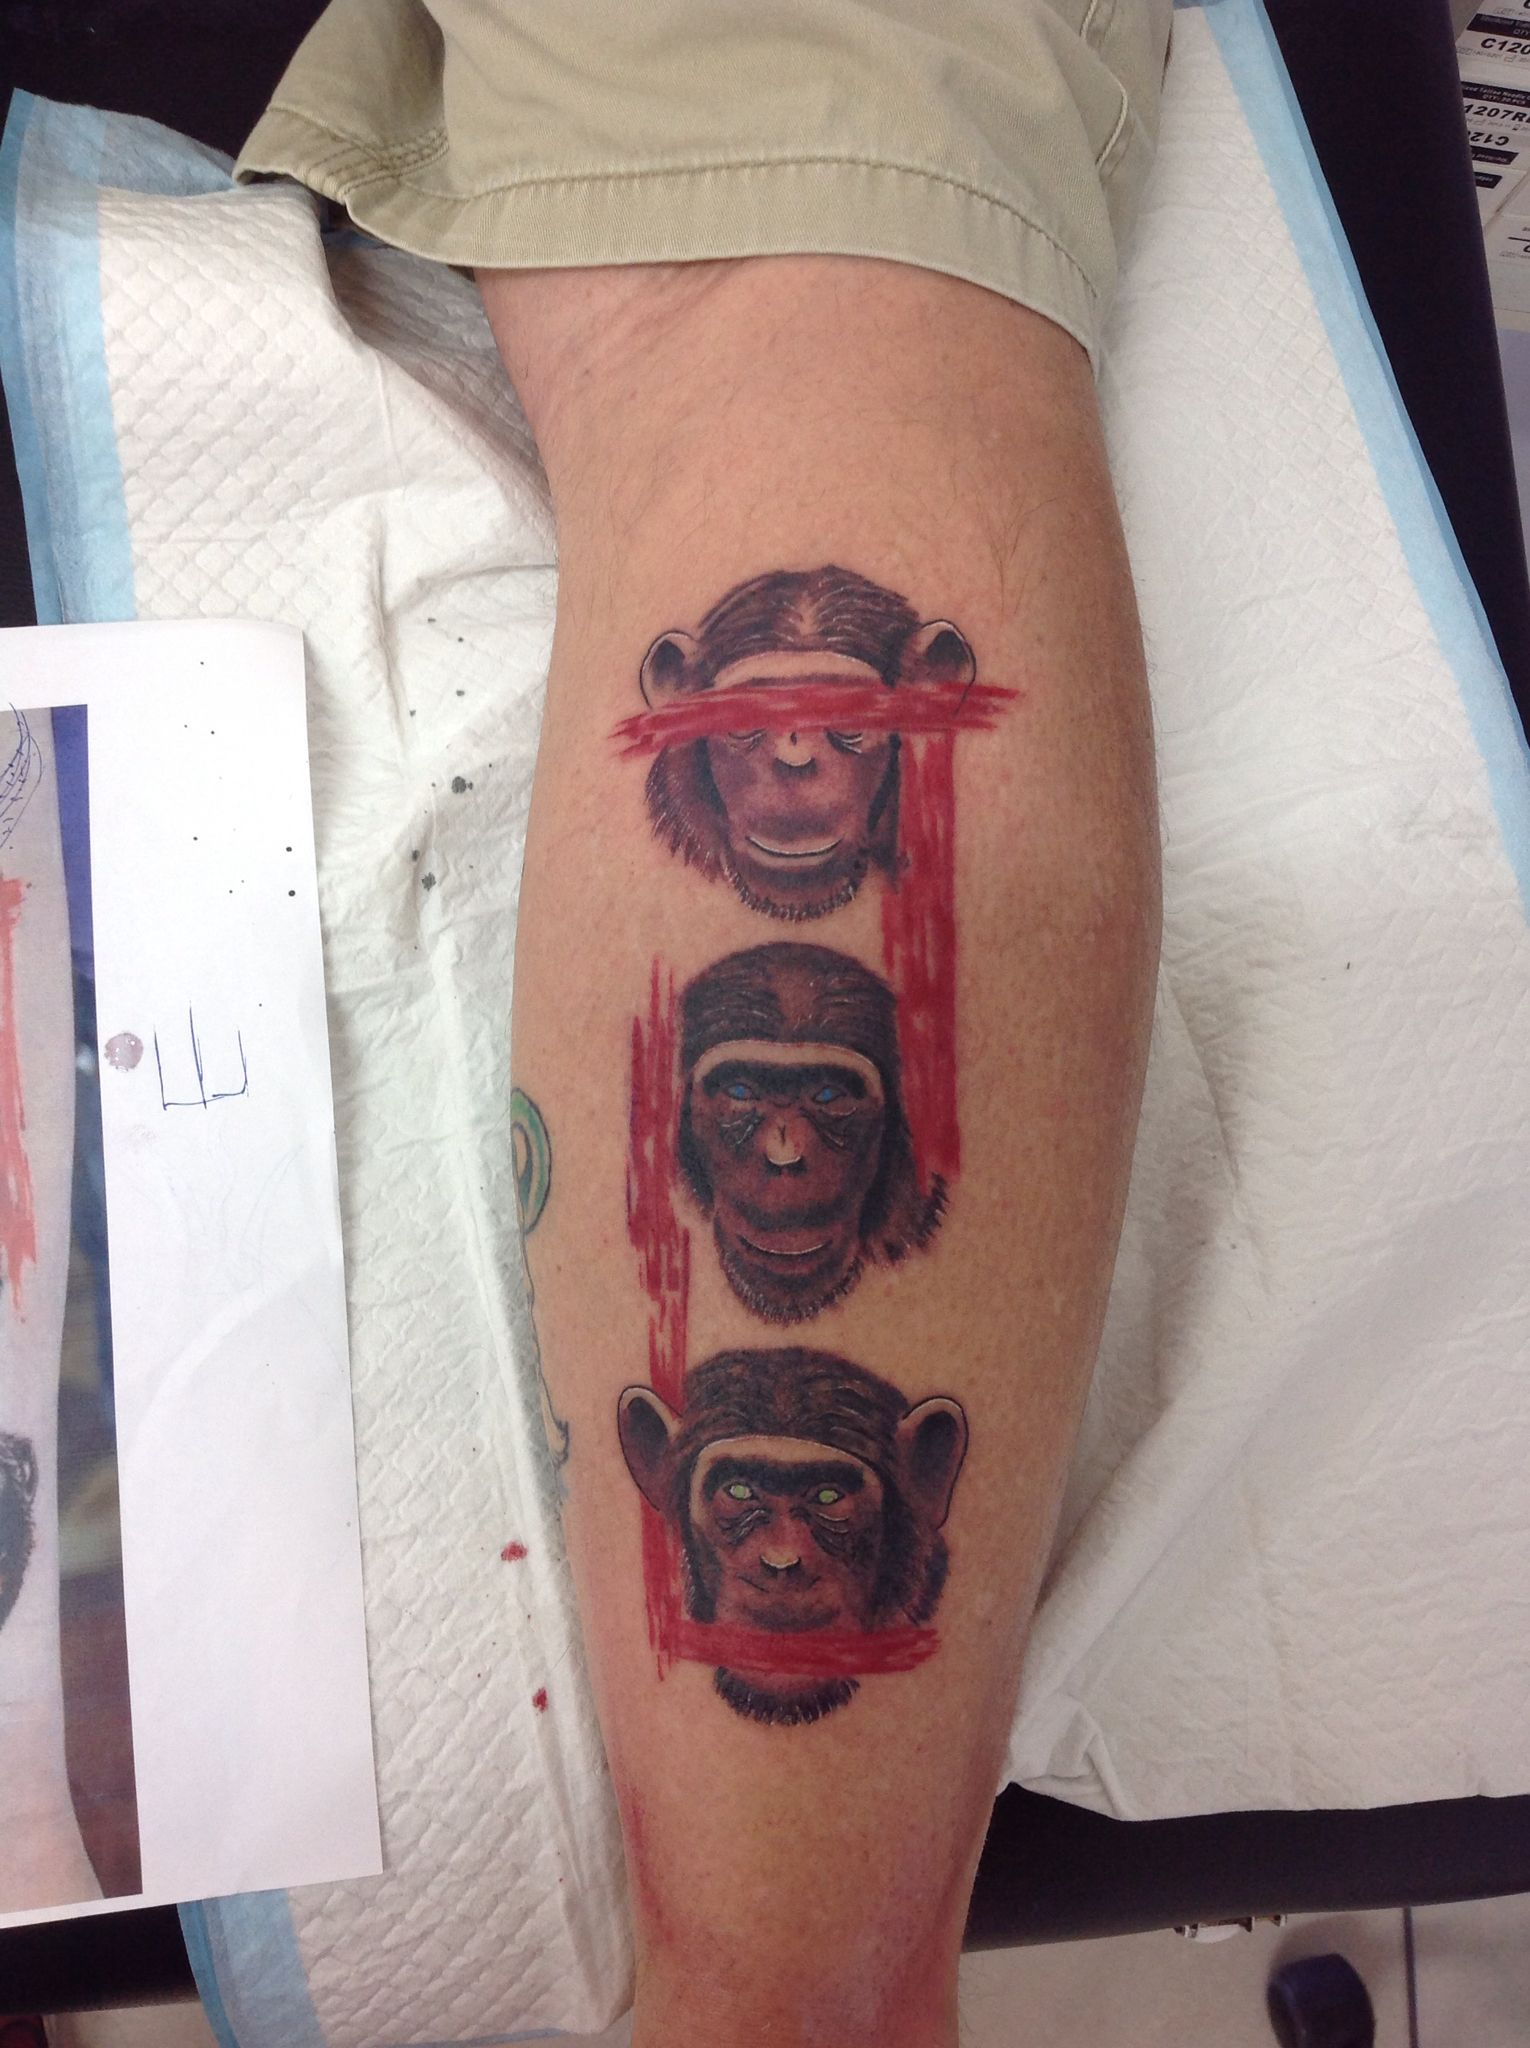 three wise monkeys tattoo tattoos pinterest affen tattoo drei affen und tattoo ideen. Black Bedroom Furniture Sets. Home Design Ideas